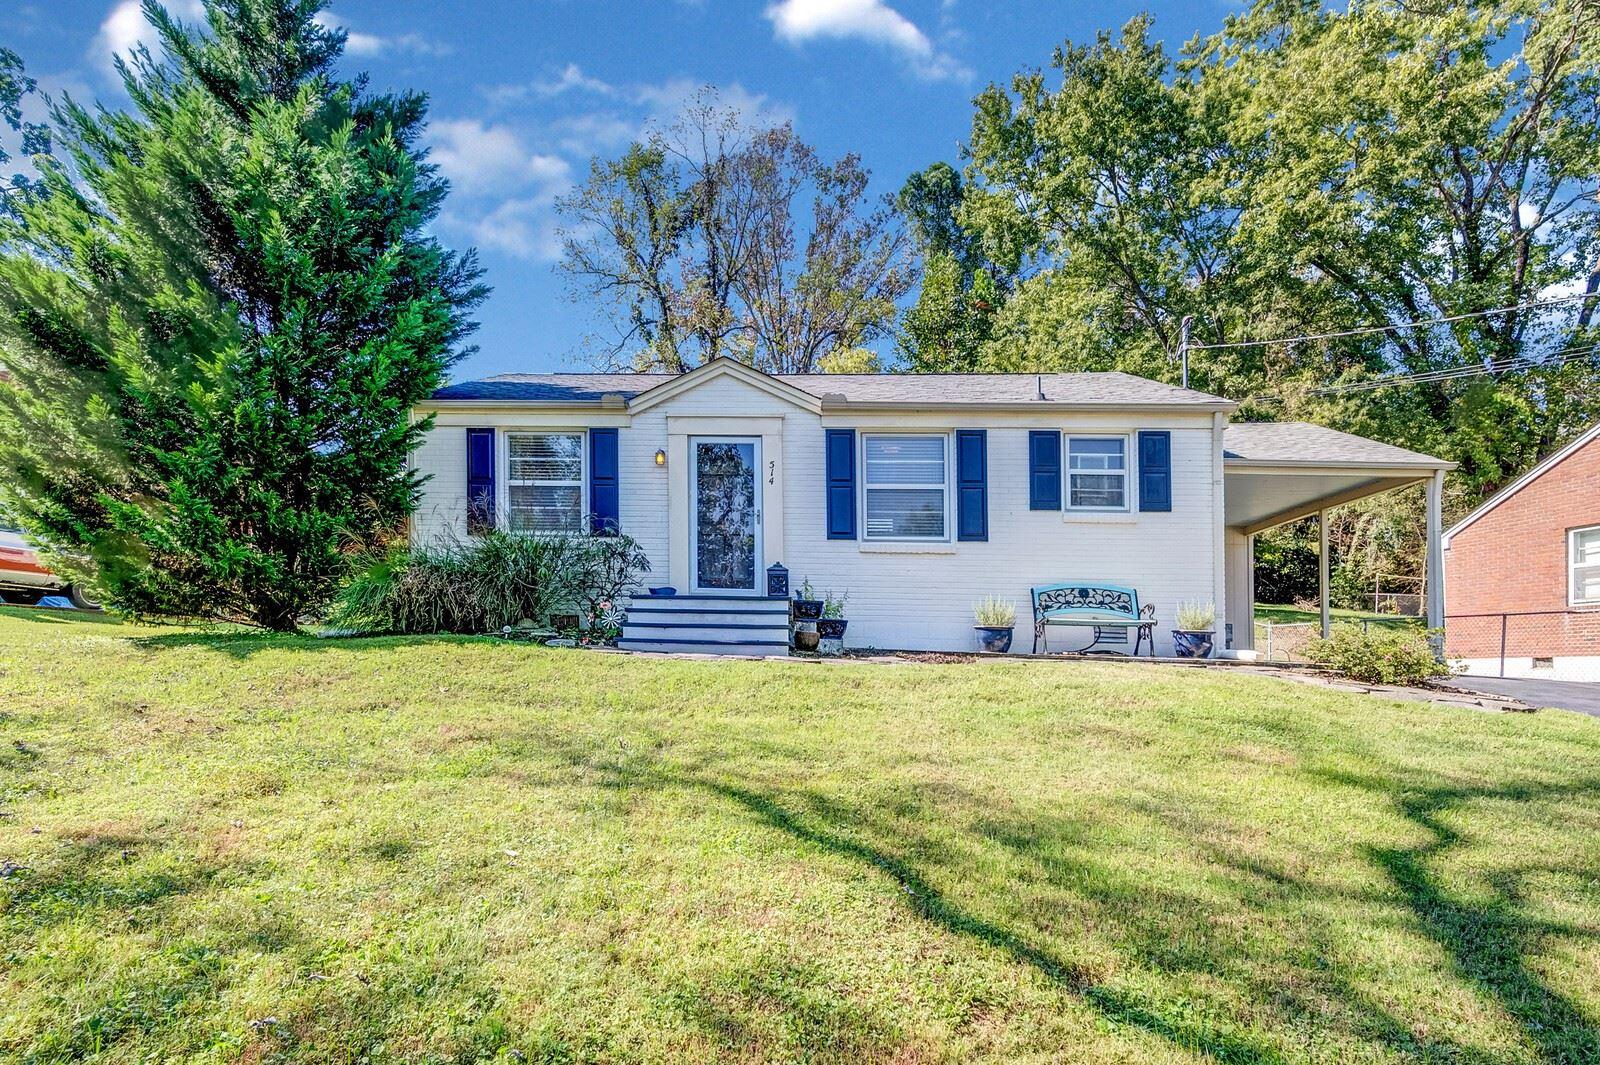 514 Cottonwood Dr, Nashville, TN 37214 - MLS#: 2298944